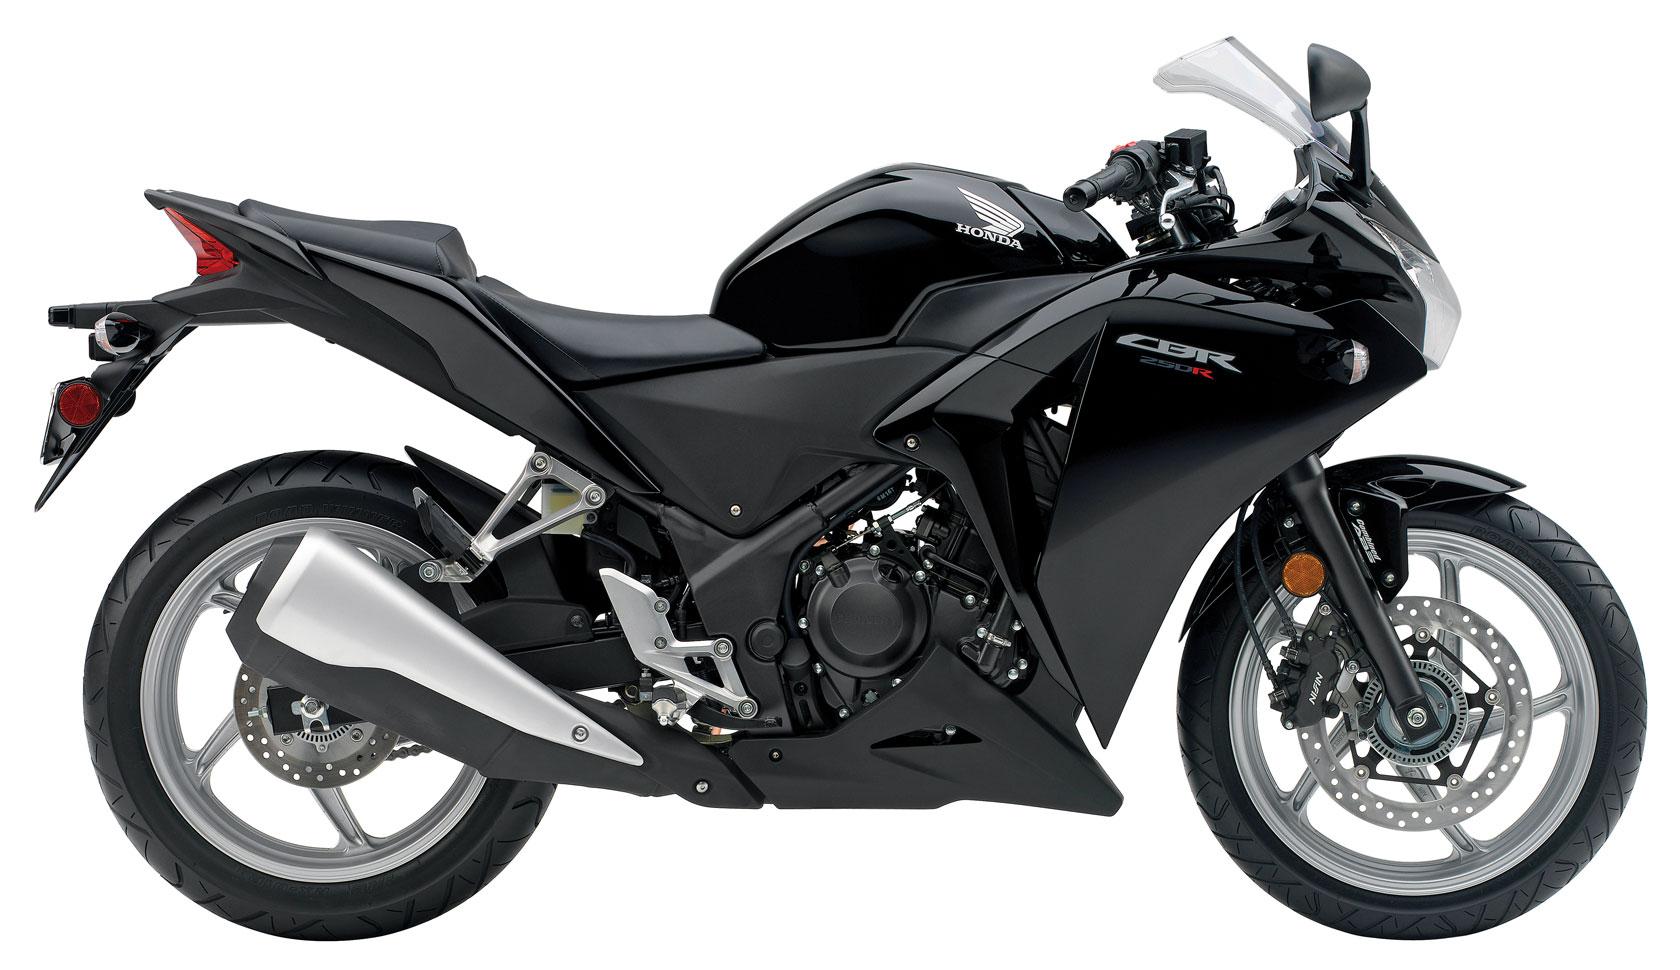 Honda Motorcycle Cbrr Abs Sportbike Free 234479 Wallpaper wallpaper